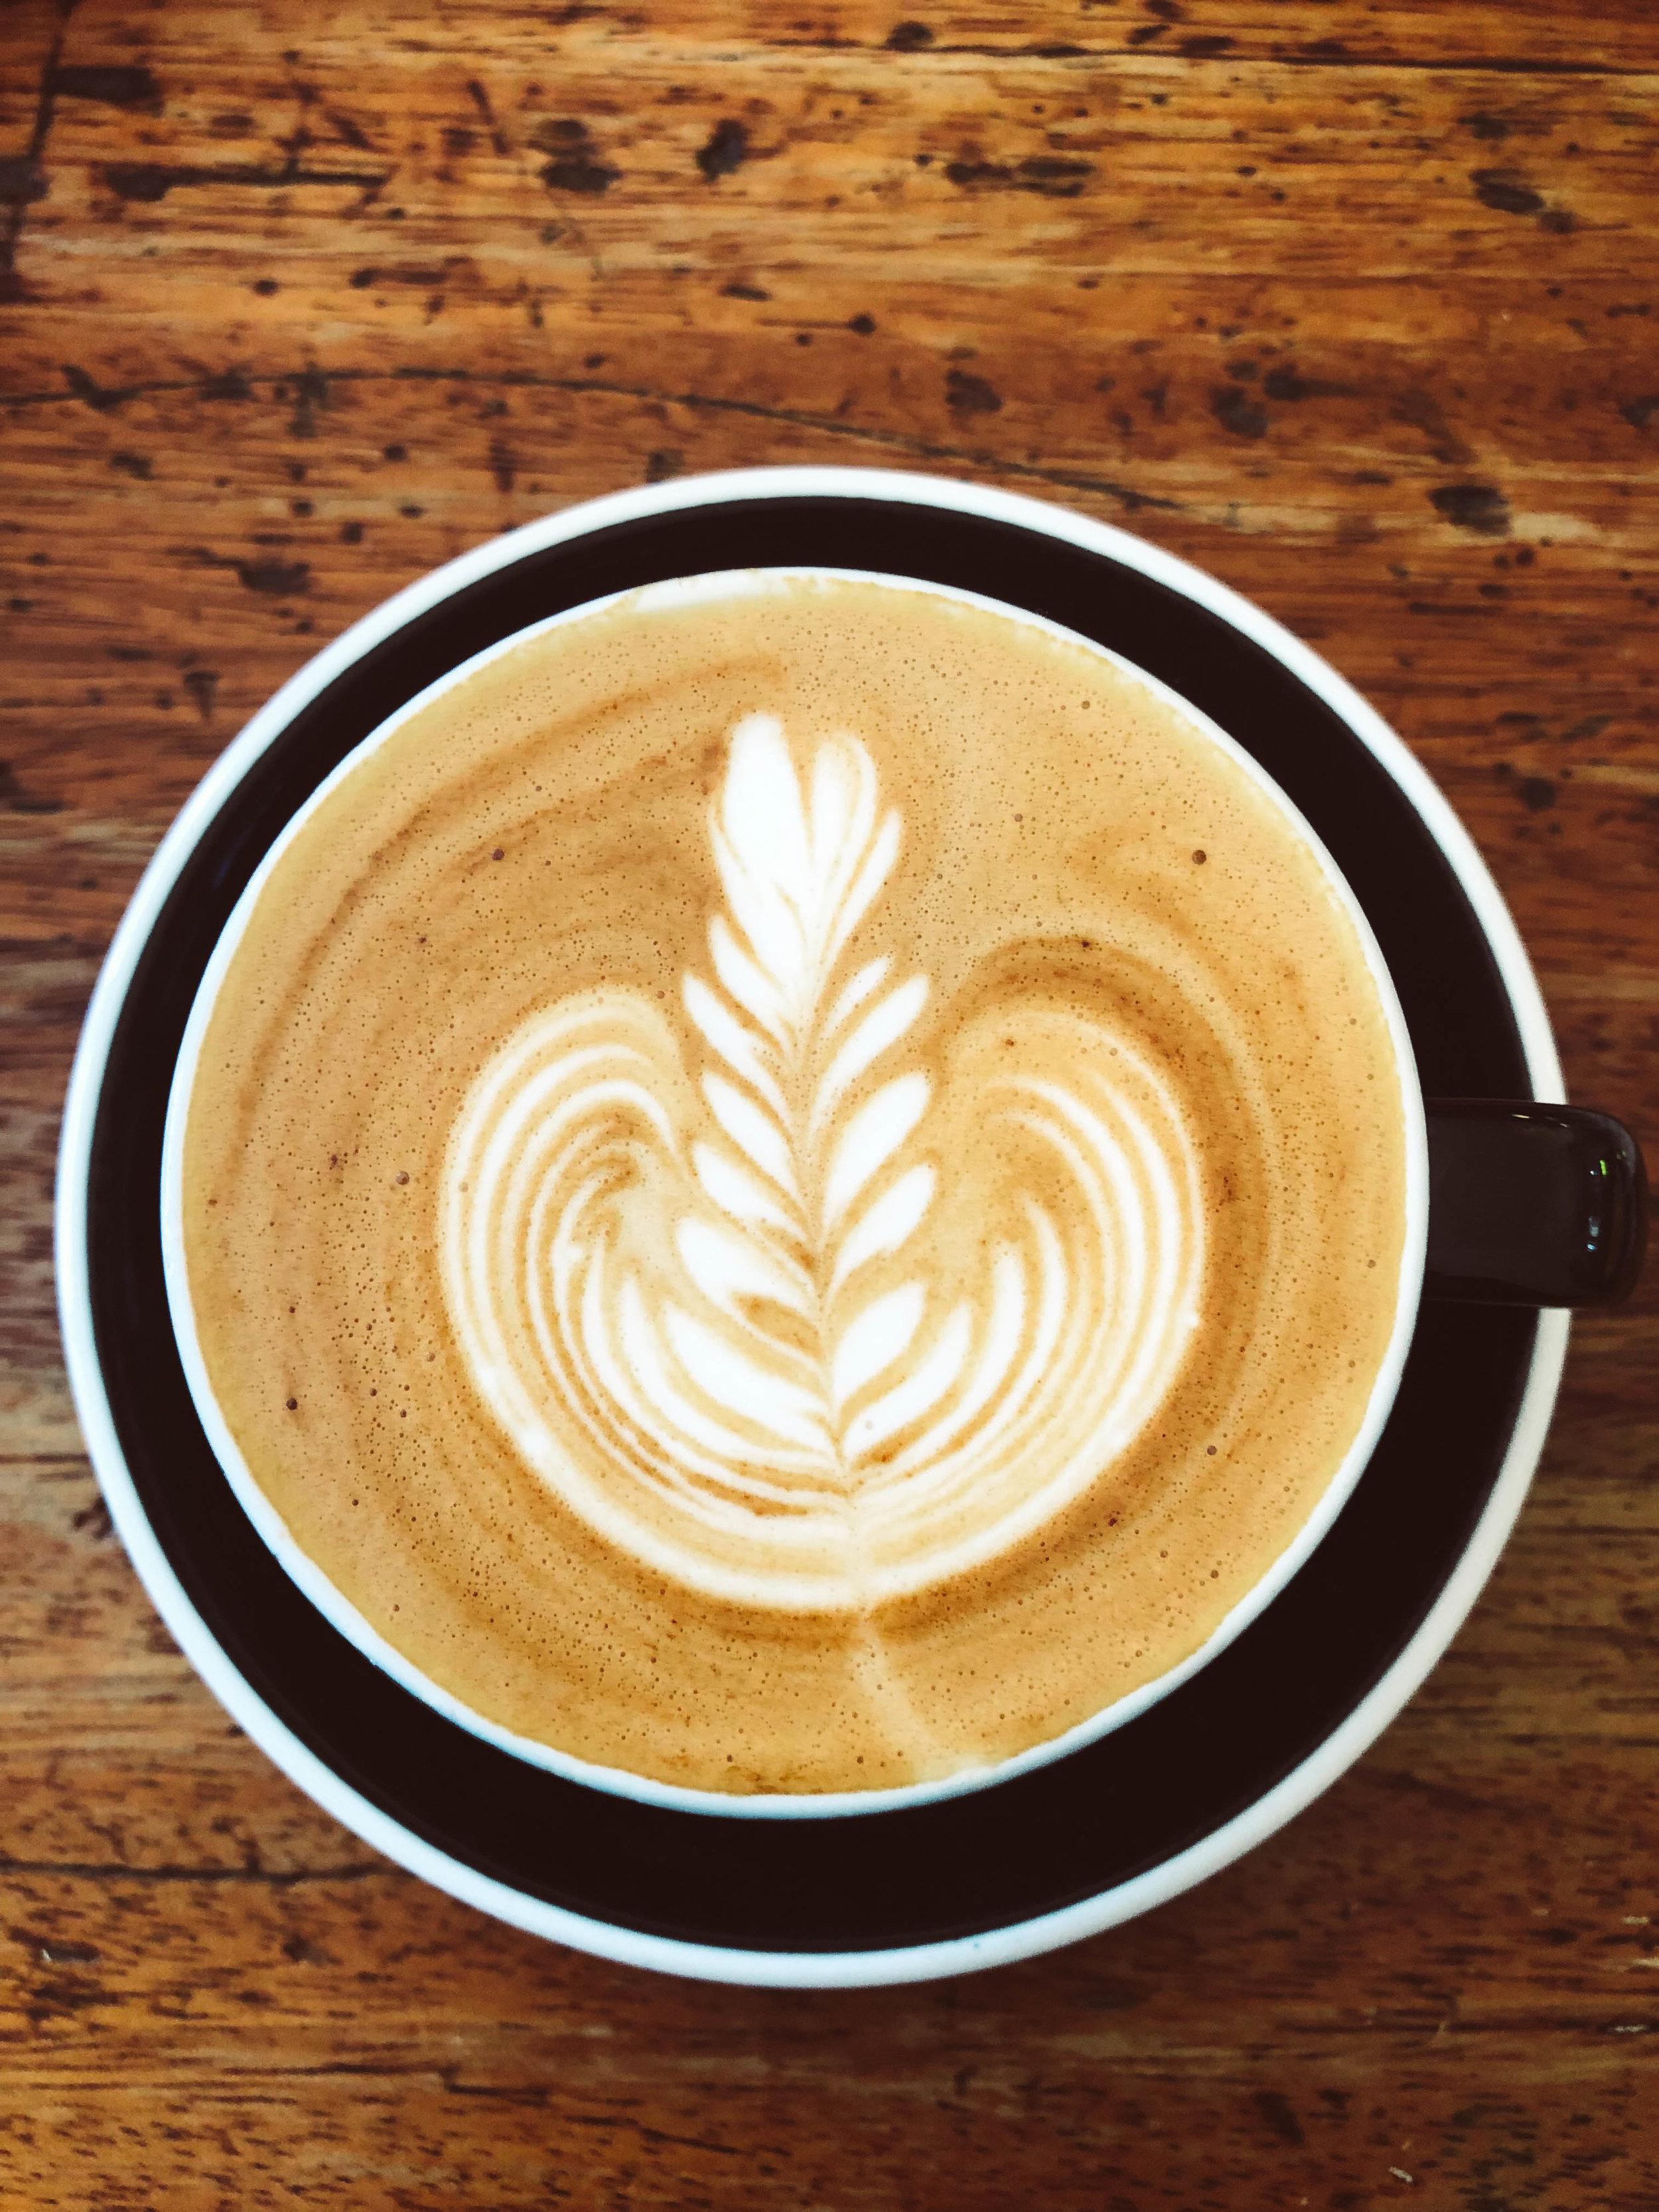 A flate white from Kaffeine in London